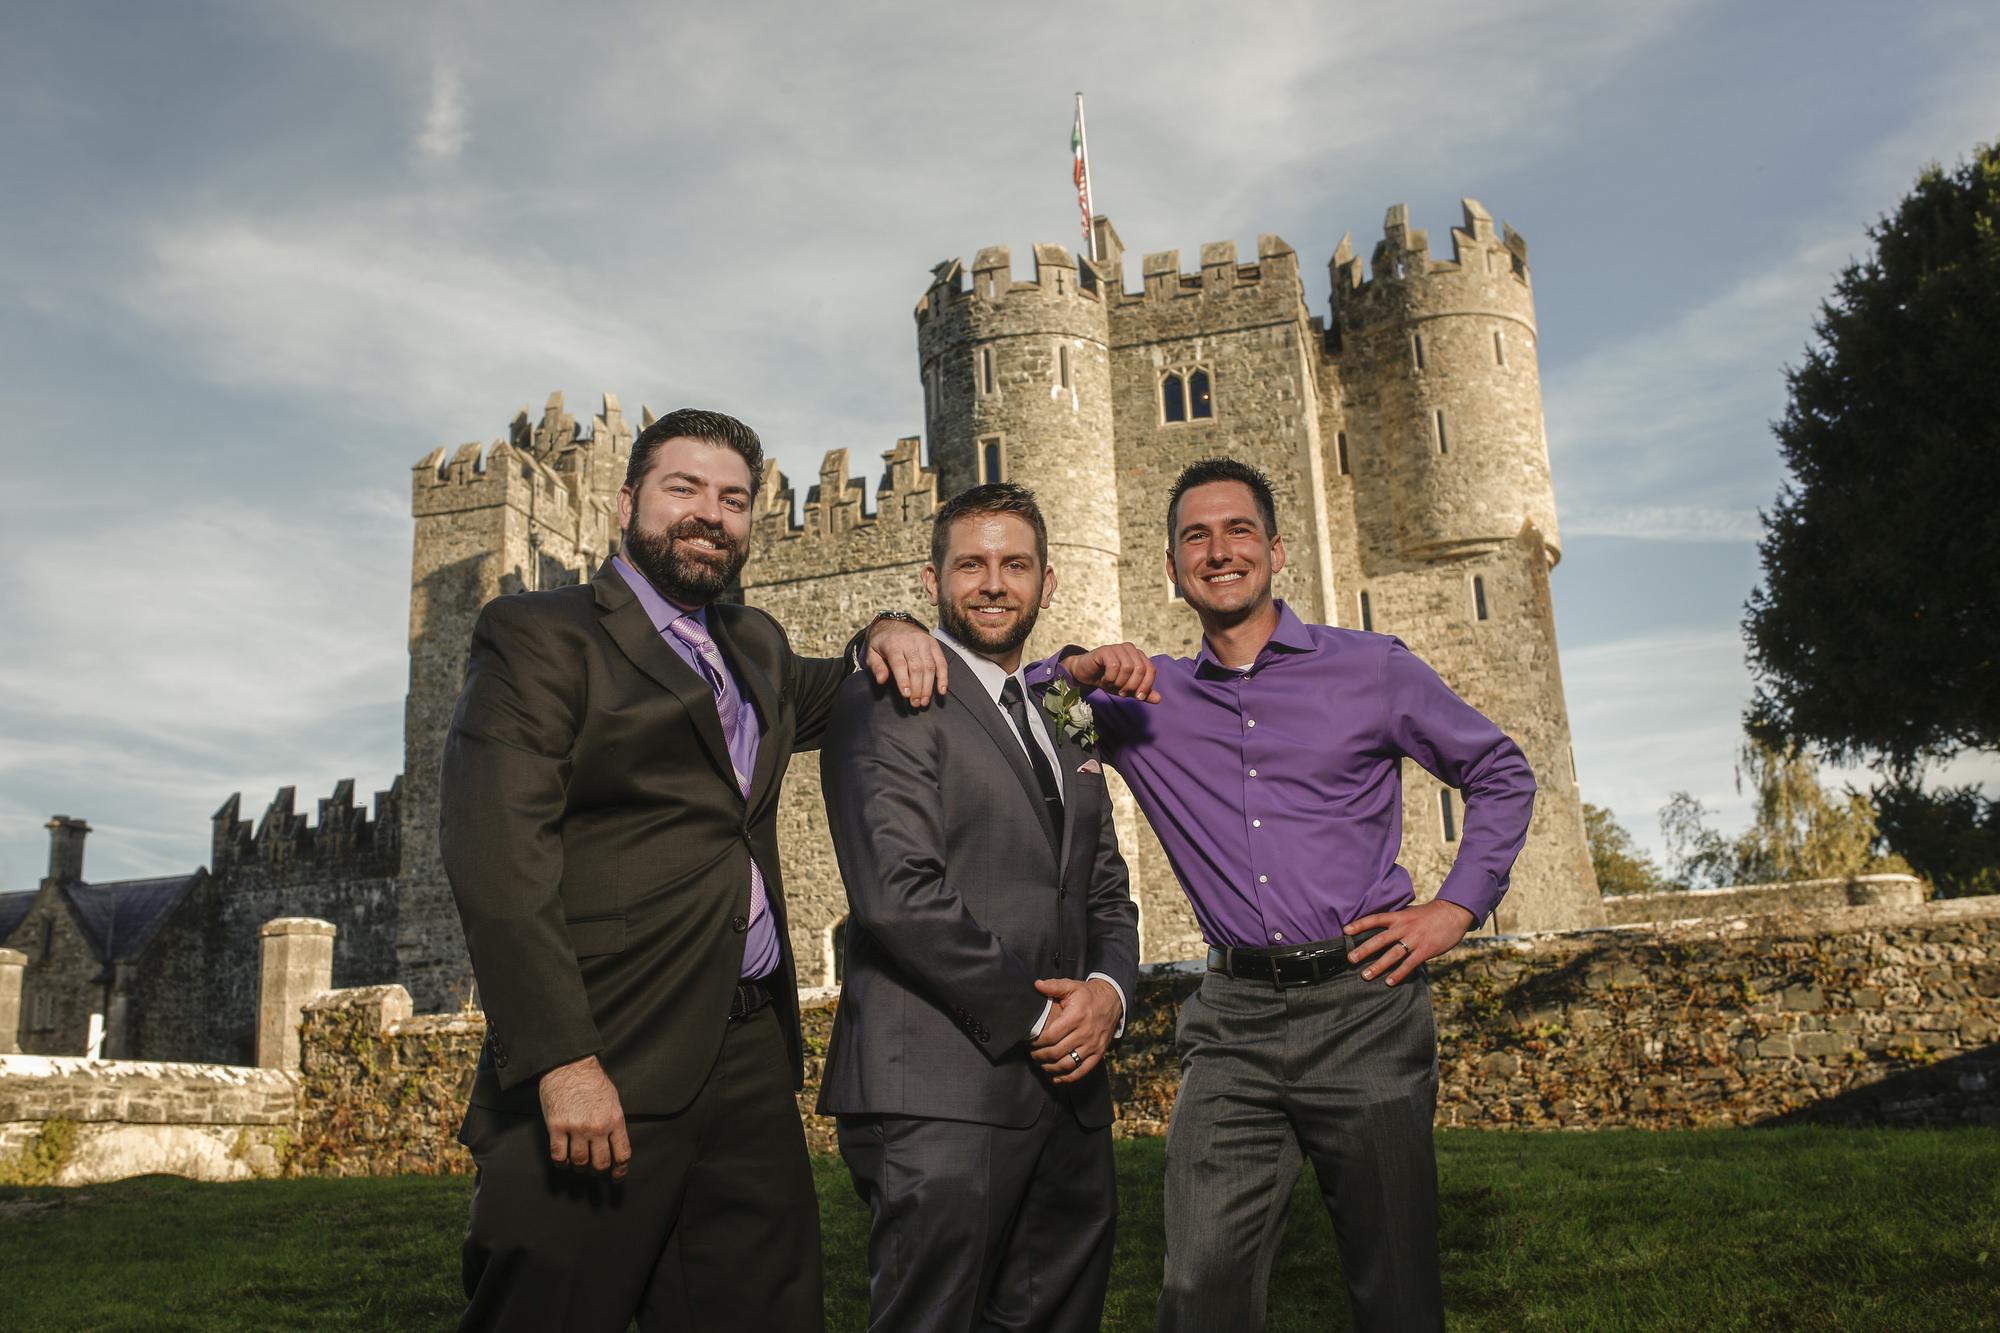 kilkea_castle_wedding_photographer_goldenmoments_041.jpg